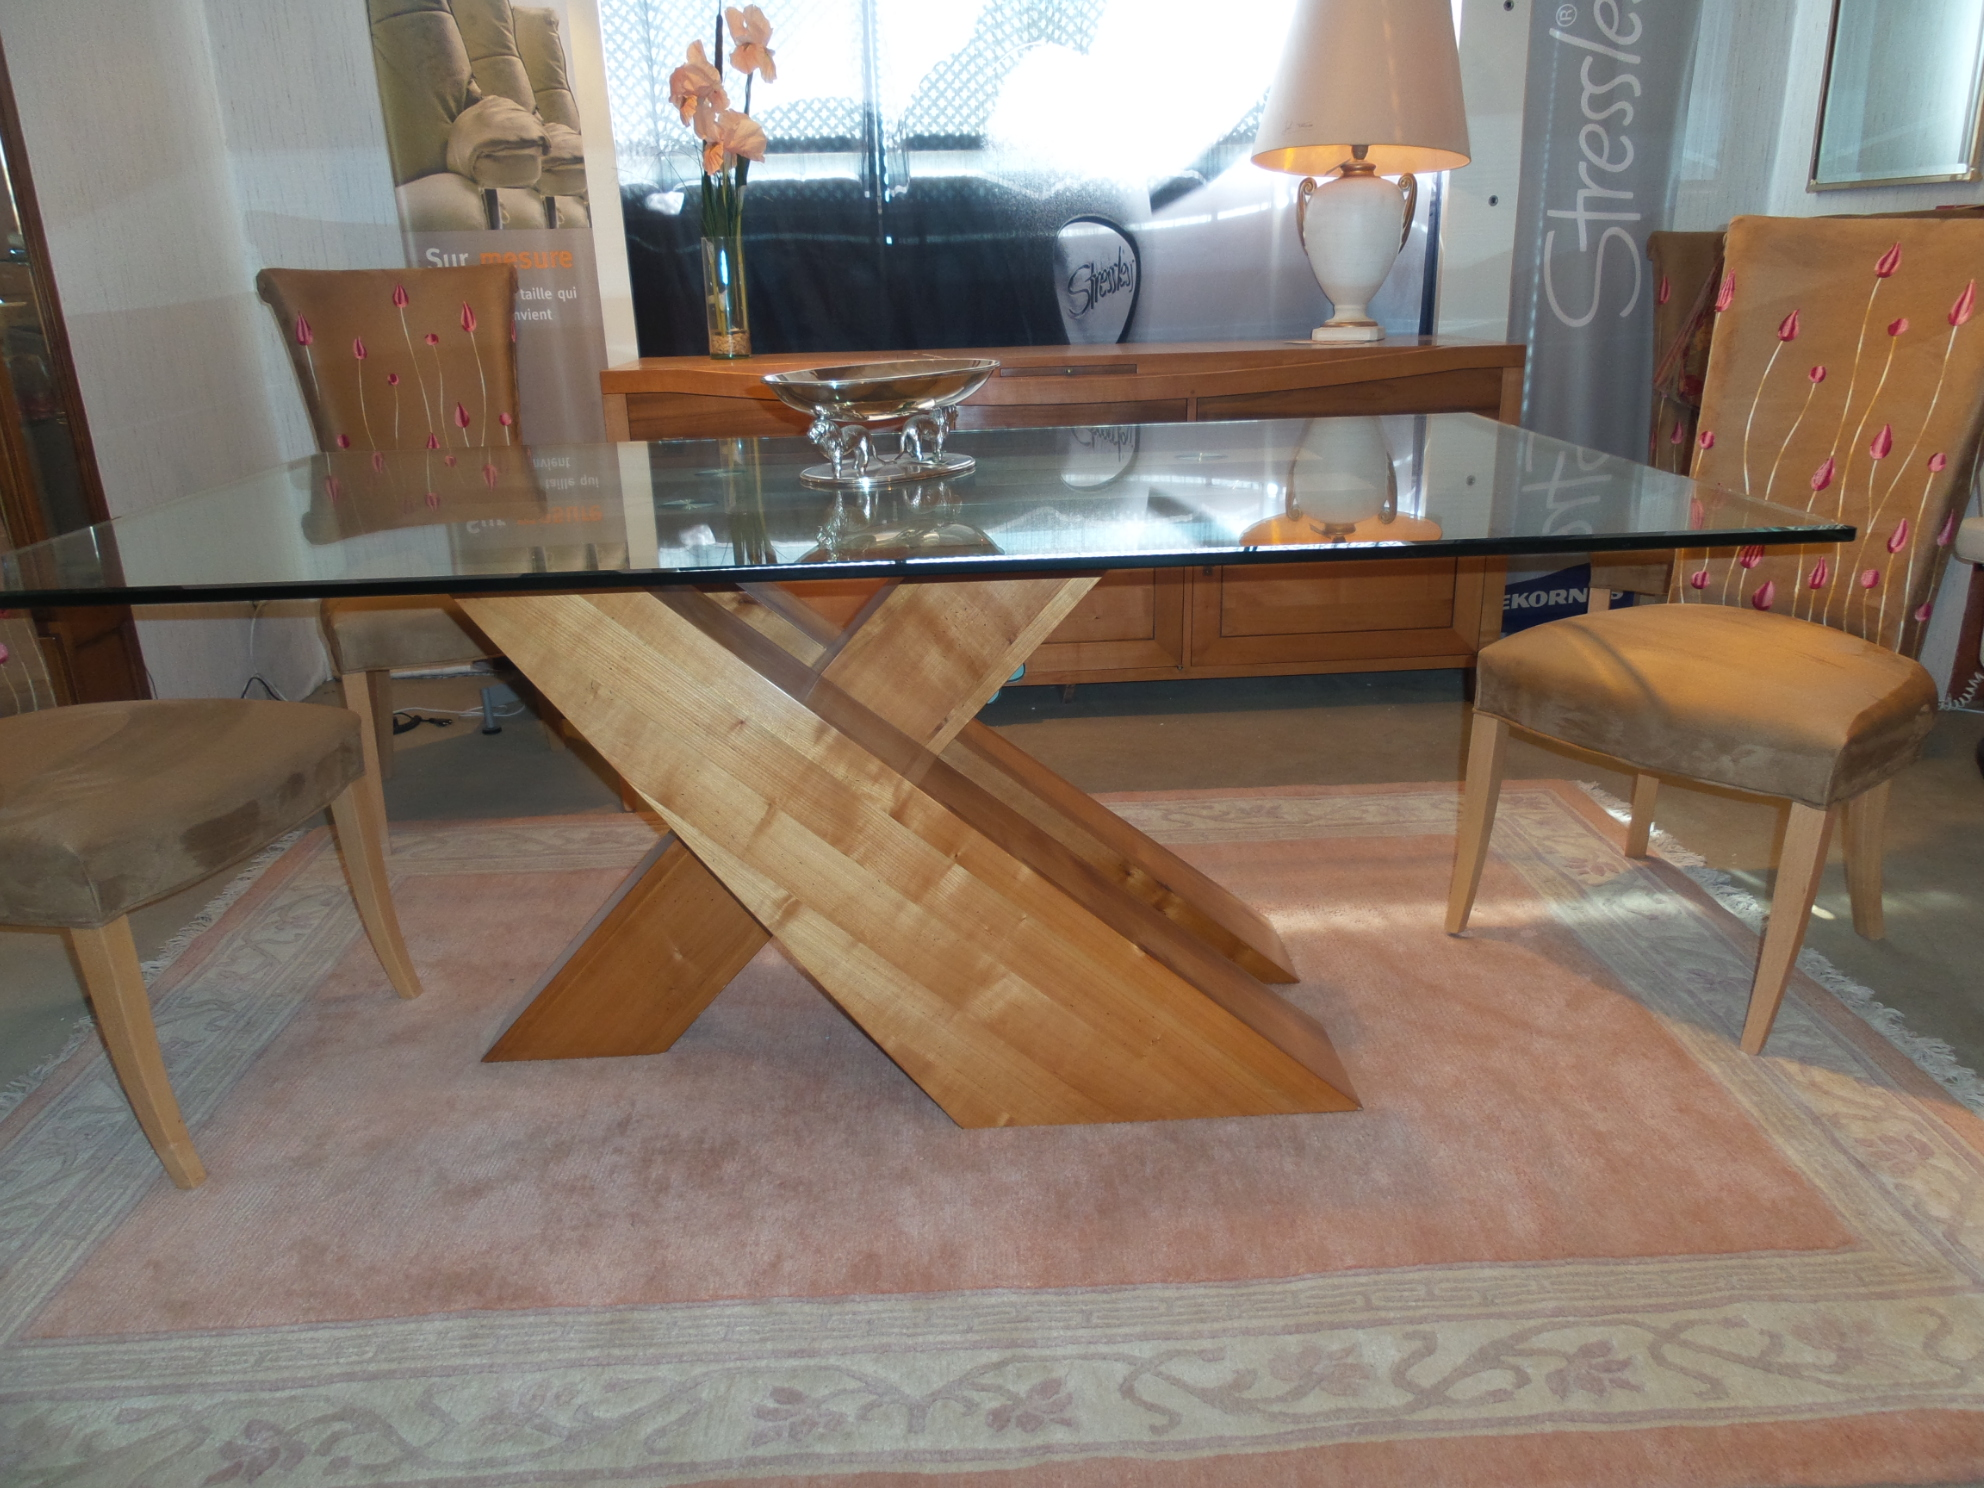 salle manger contemporaine pied x en bois merisier massif et dessus verre biseaut. Black Bedroom Furniture Sets. Home Design Ideas